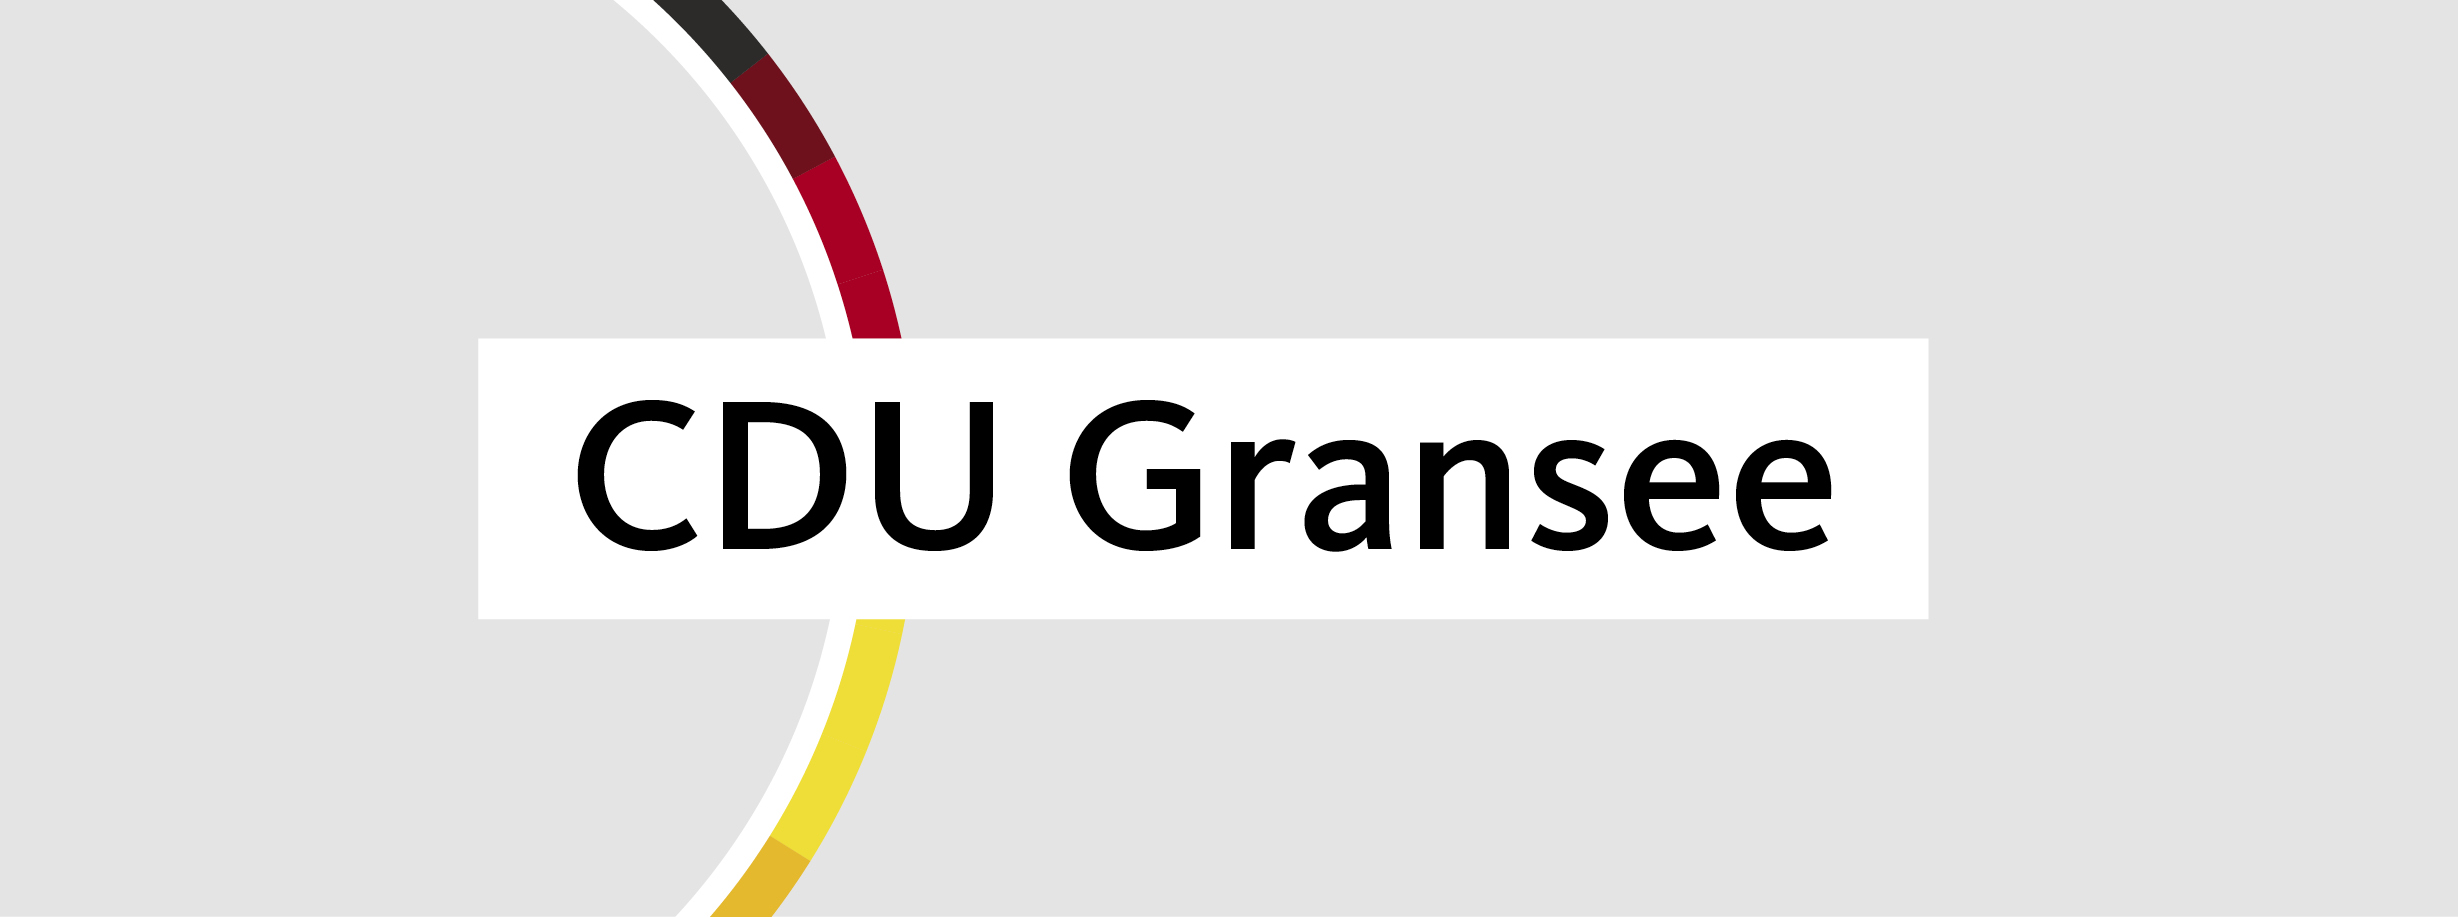 CDU Gransee